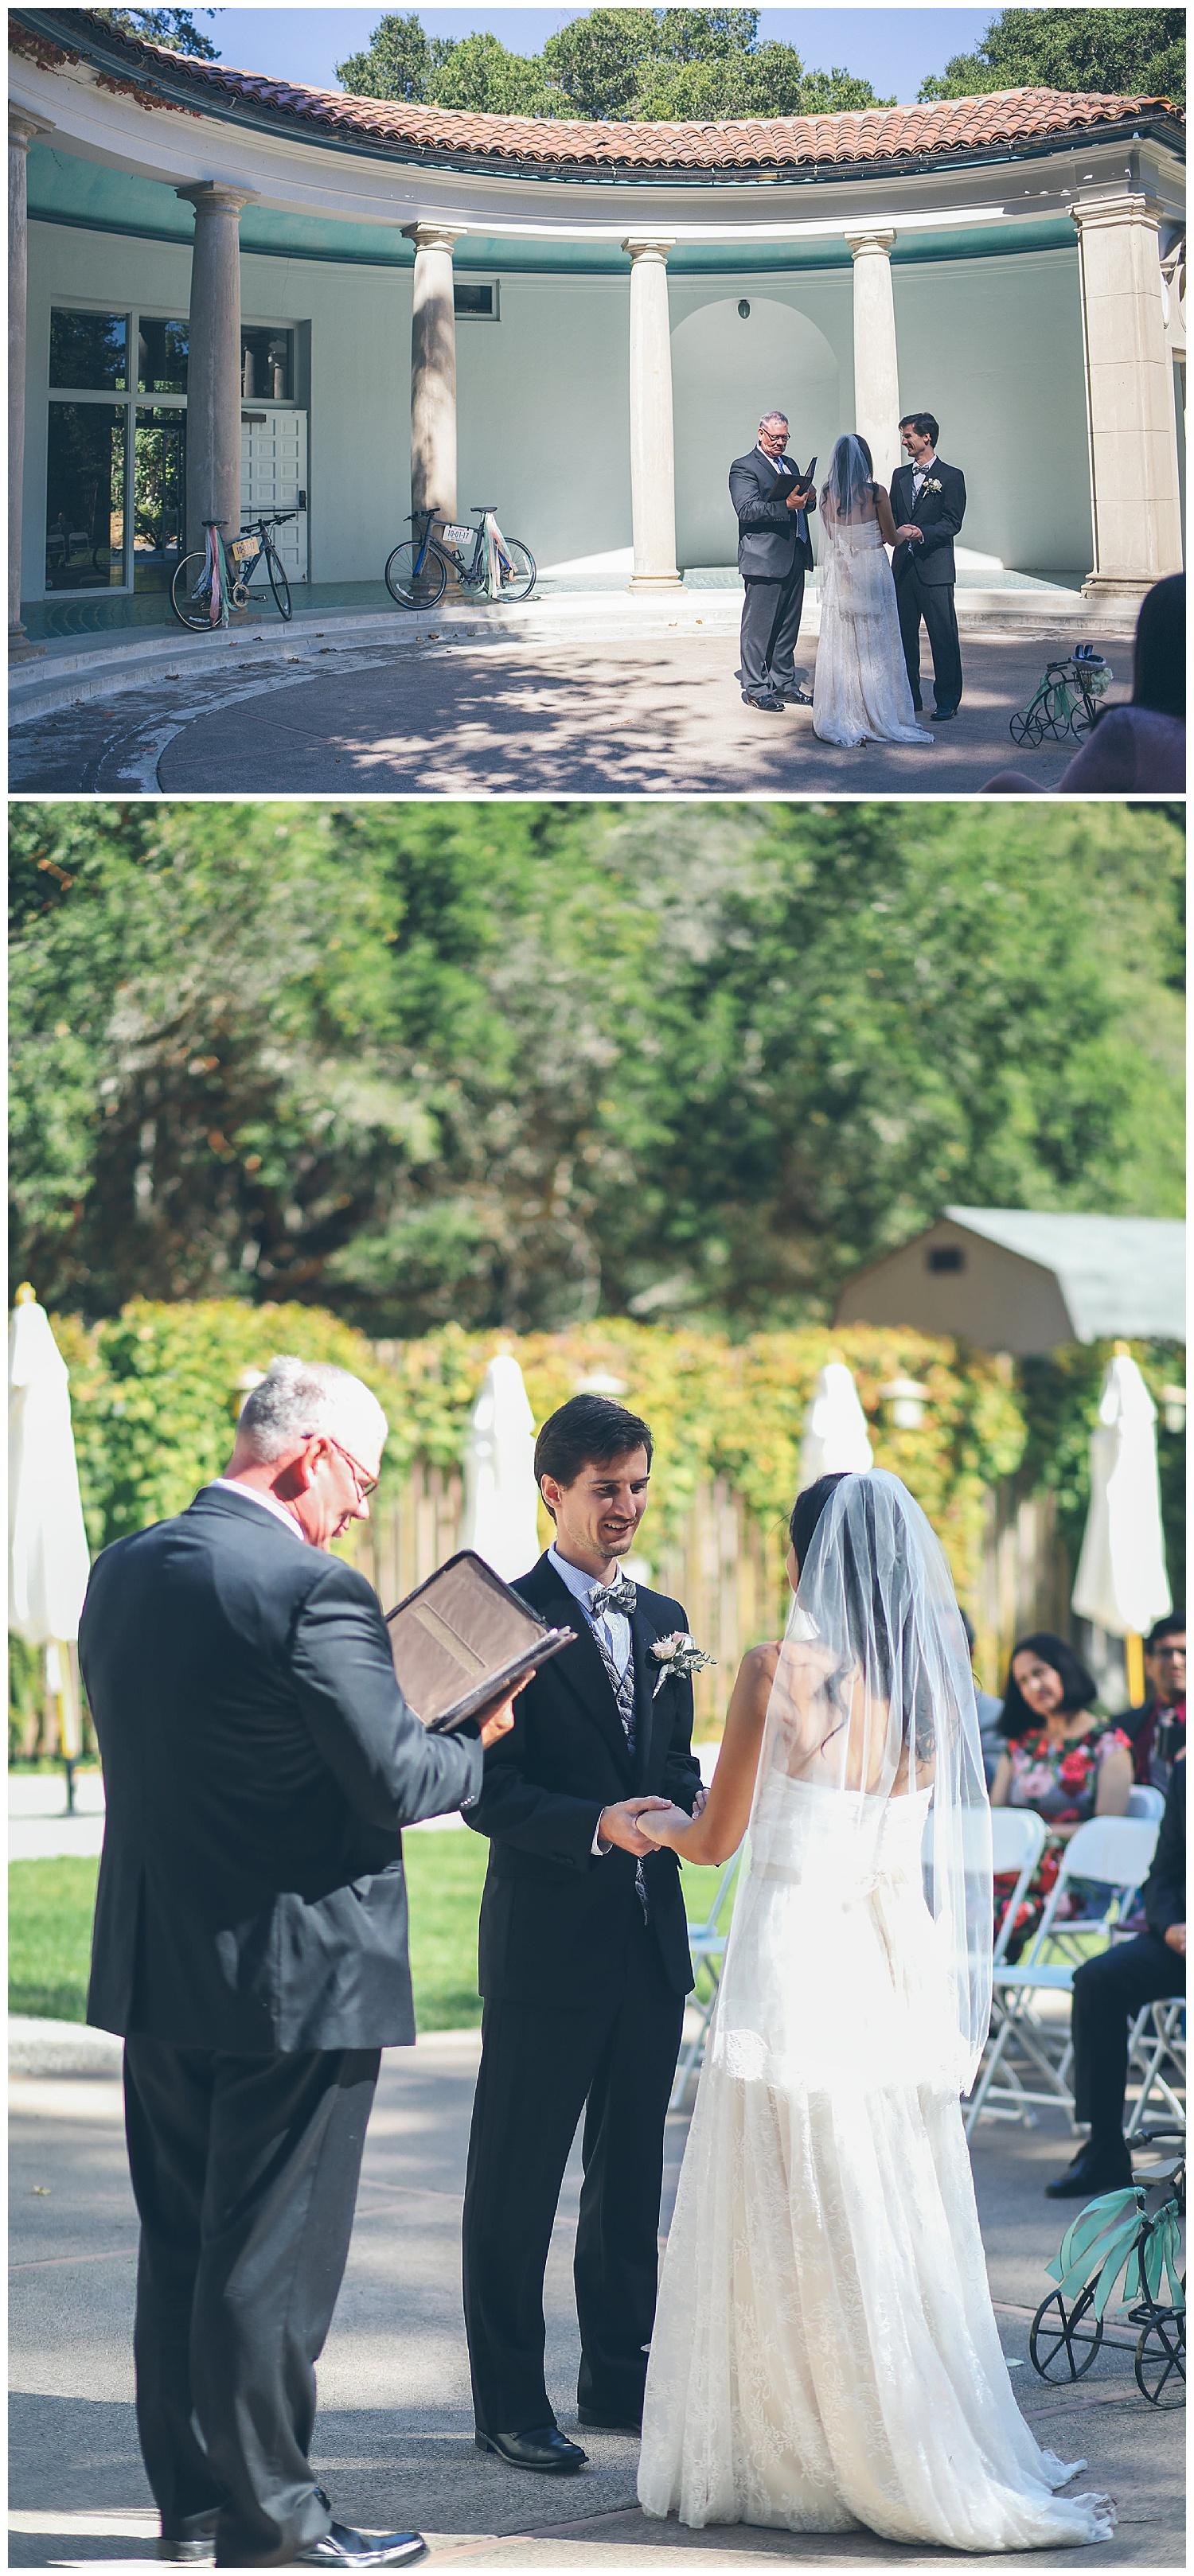 khariza-rae-photography-bay-area-wedding-photographer_0142.jpg